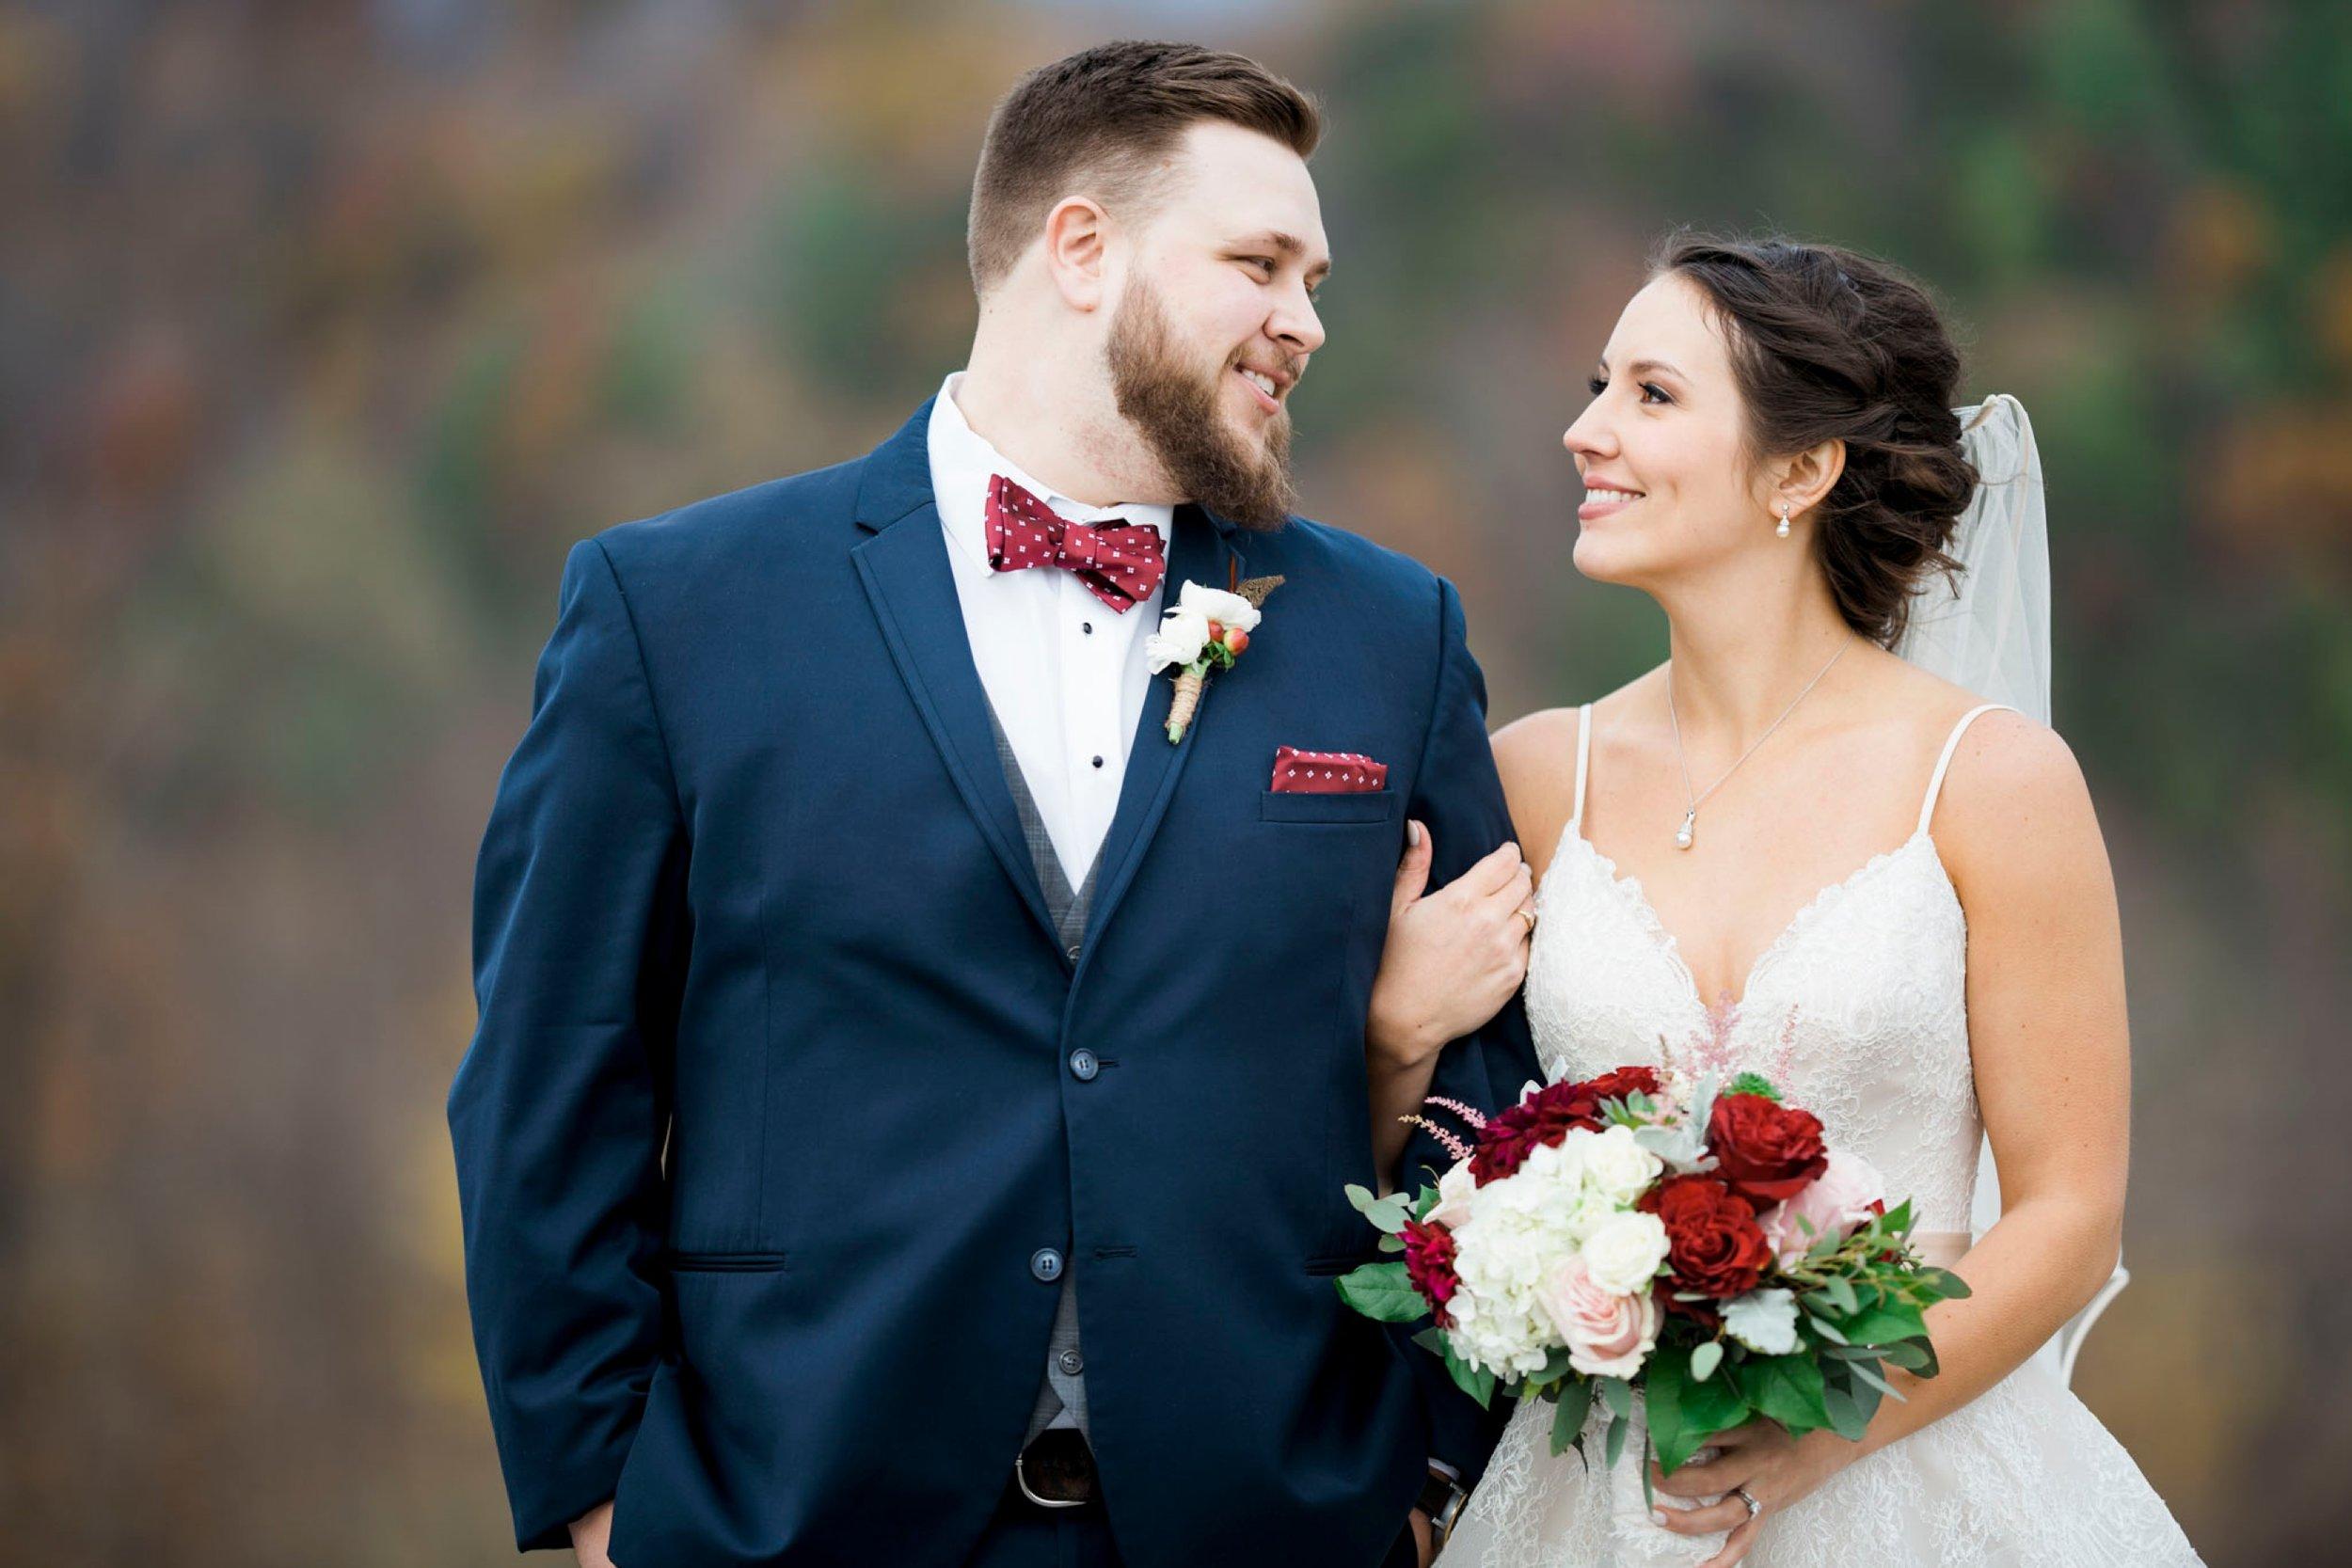 IrvineEstate_LexingtonVA_Wedding_FallWedding_VirginiaWeddingPhotographer 78.jpg